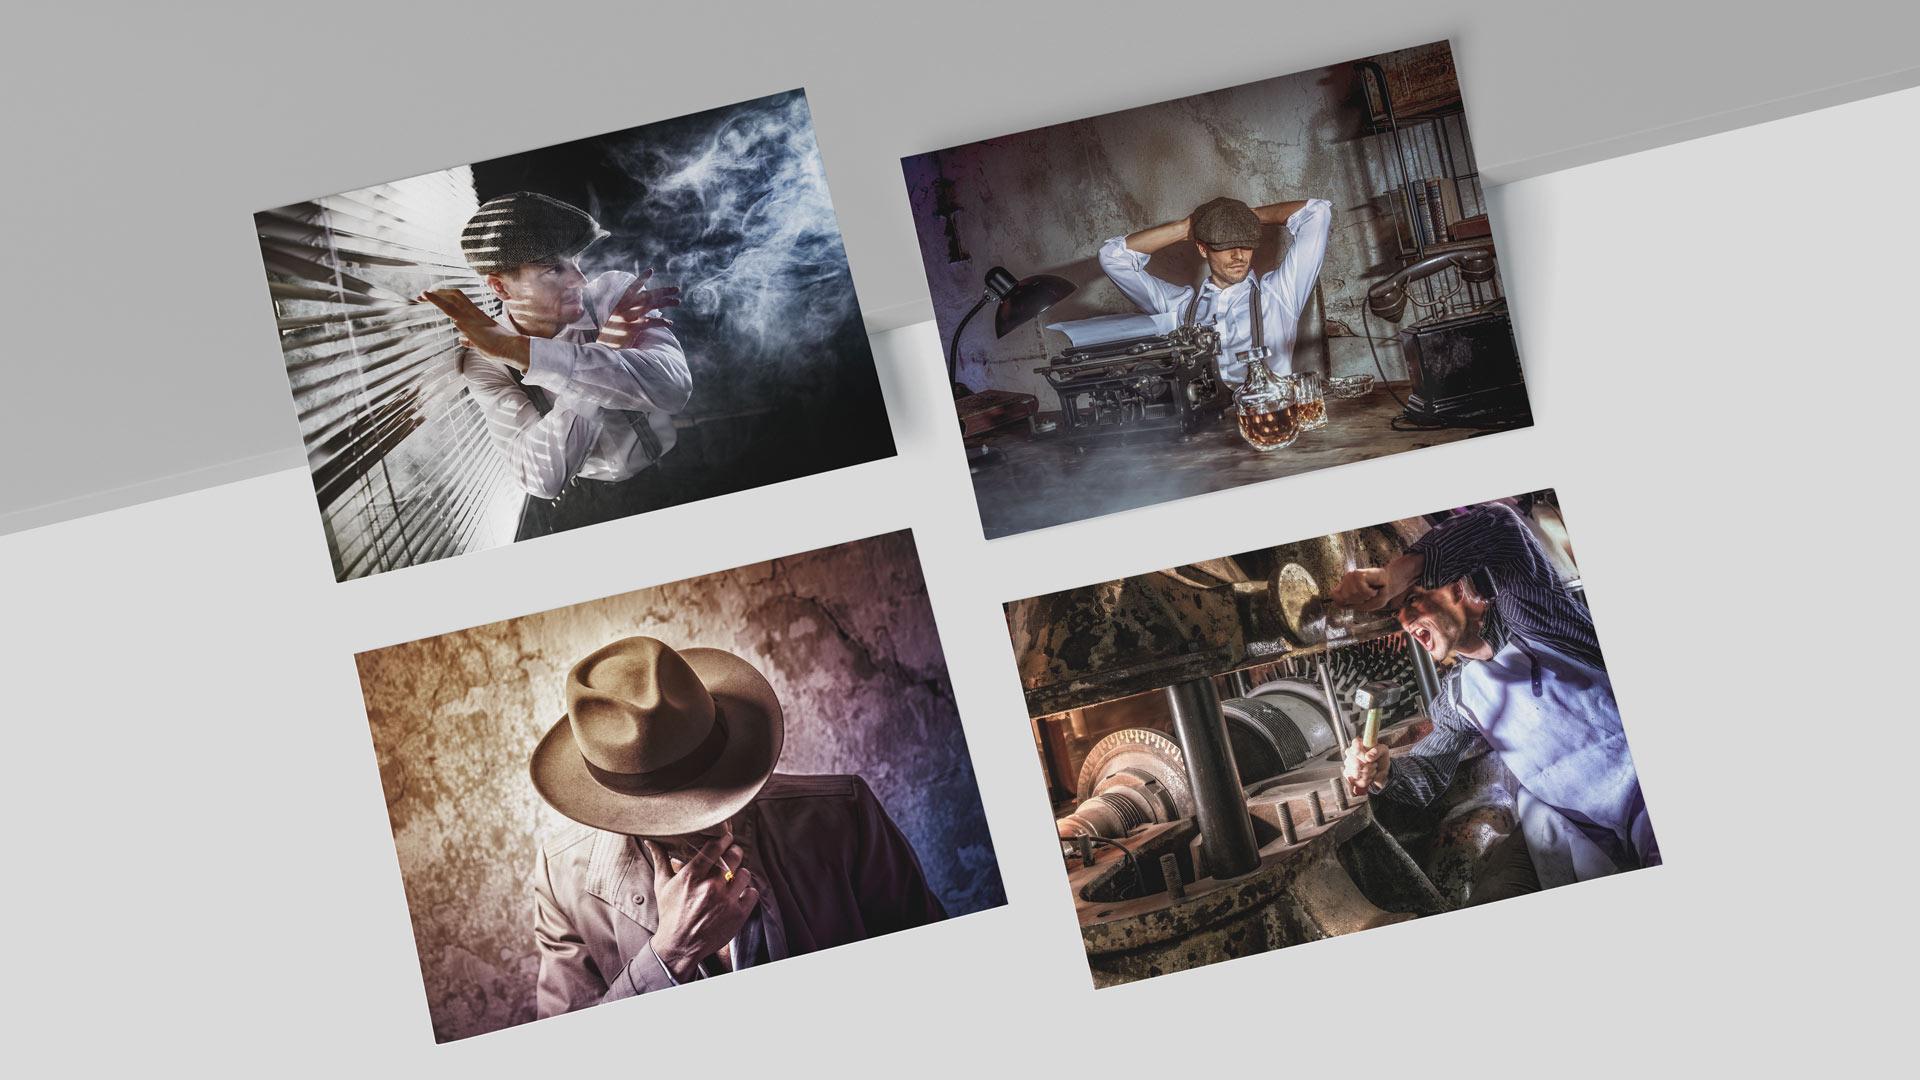 Kreatives Film Noir Fotoshooting für Imagebilder